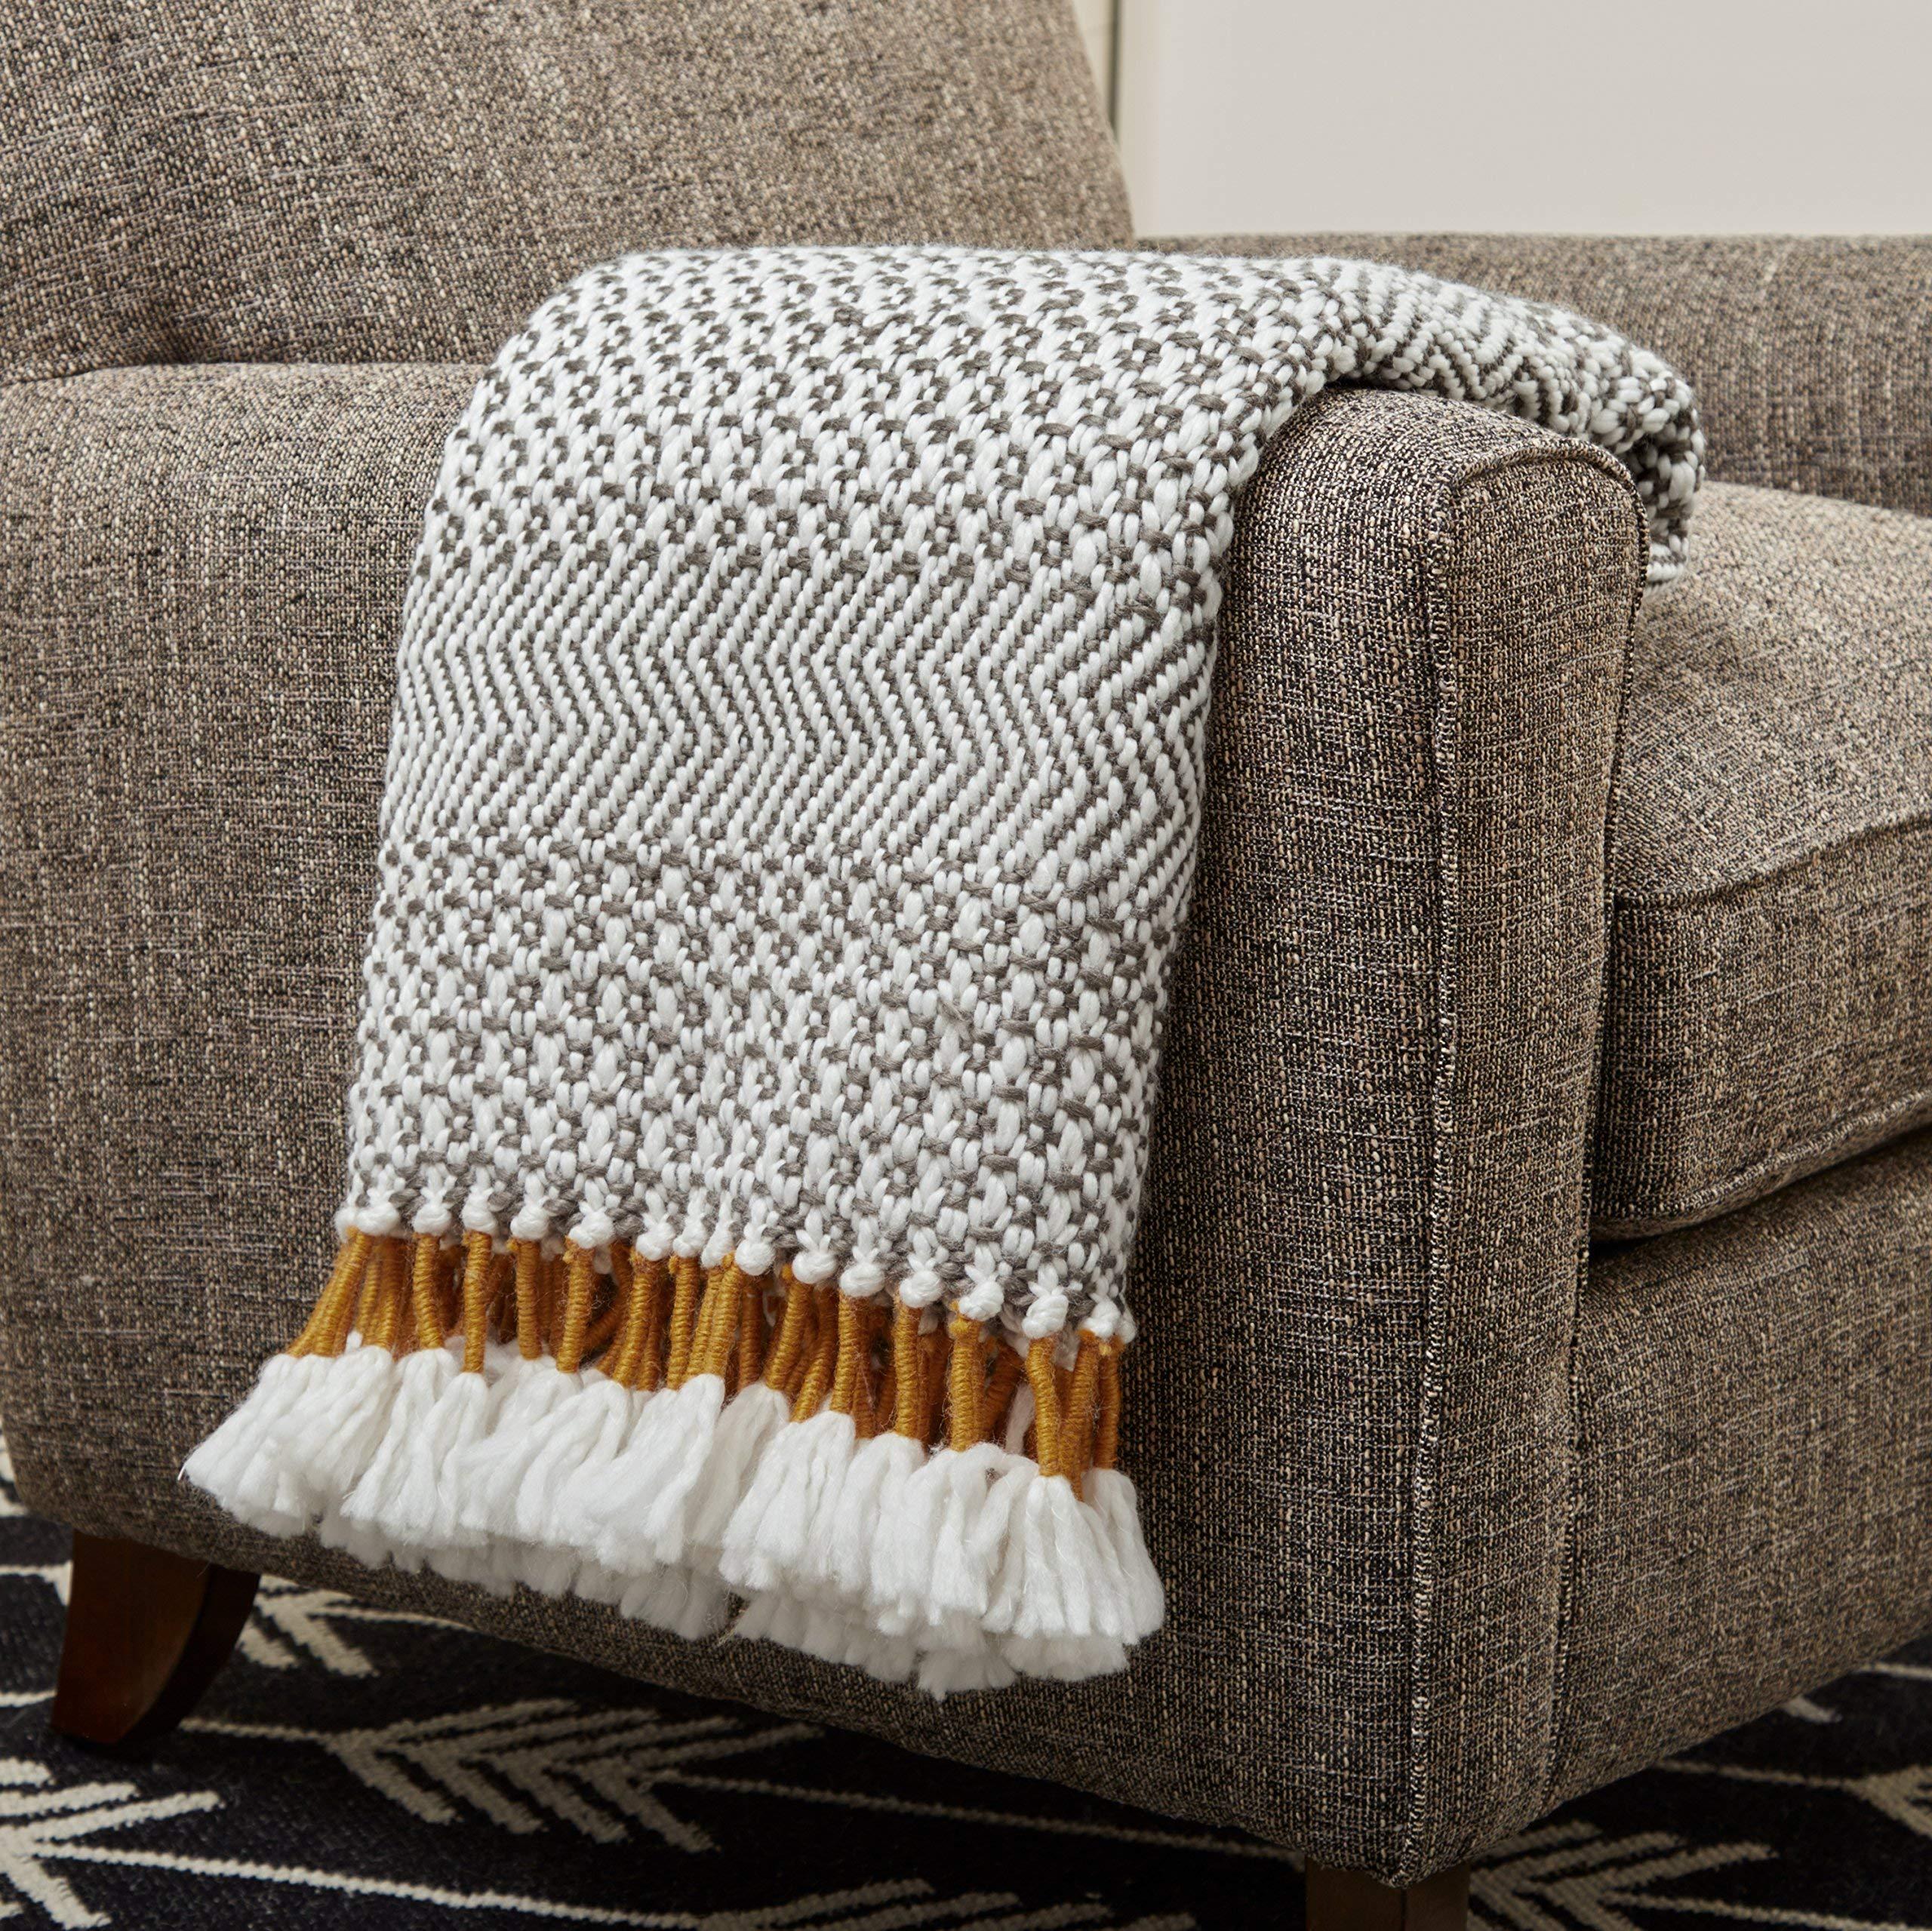 Rivet Modern Hand-Woven Stripe Fringe Throw Blanket, Soft and Stylish, 50'' x 60'', Charcoal